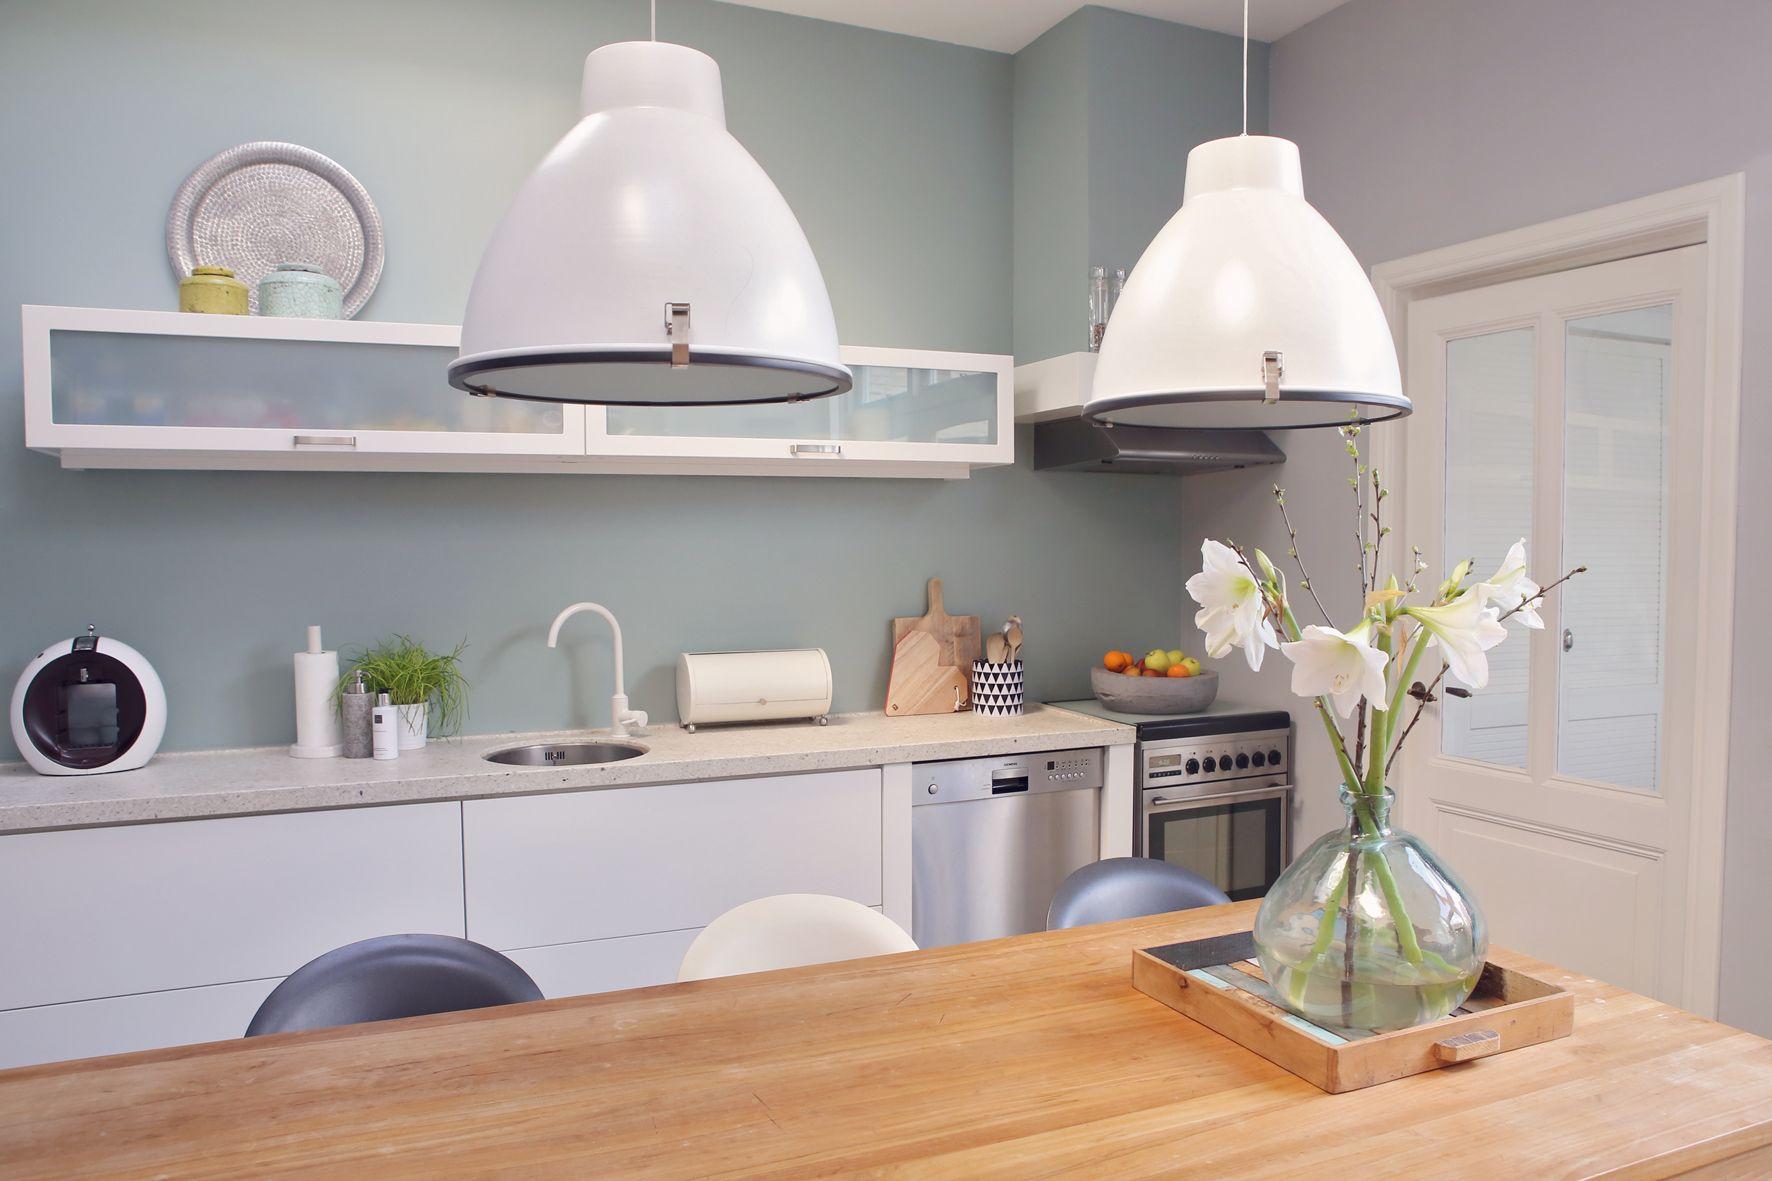 Witte Keuken Bovenkastjes : Leuke witte keuken met lichtgrijs blad. langwerpige bovenkastjes met